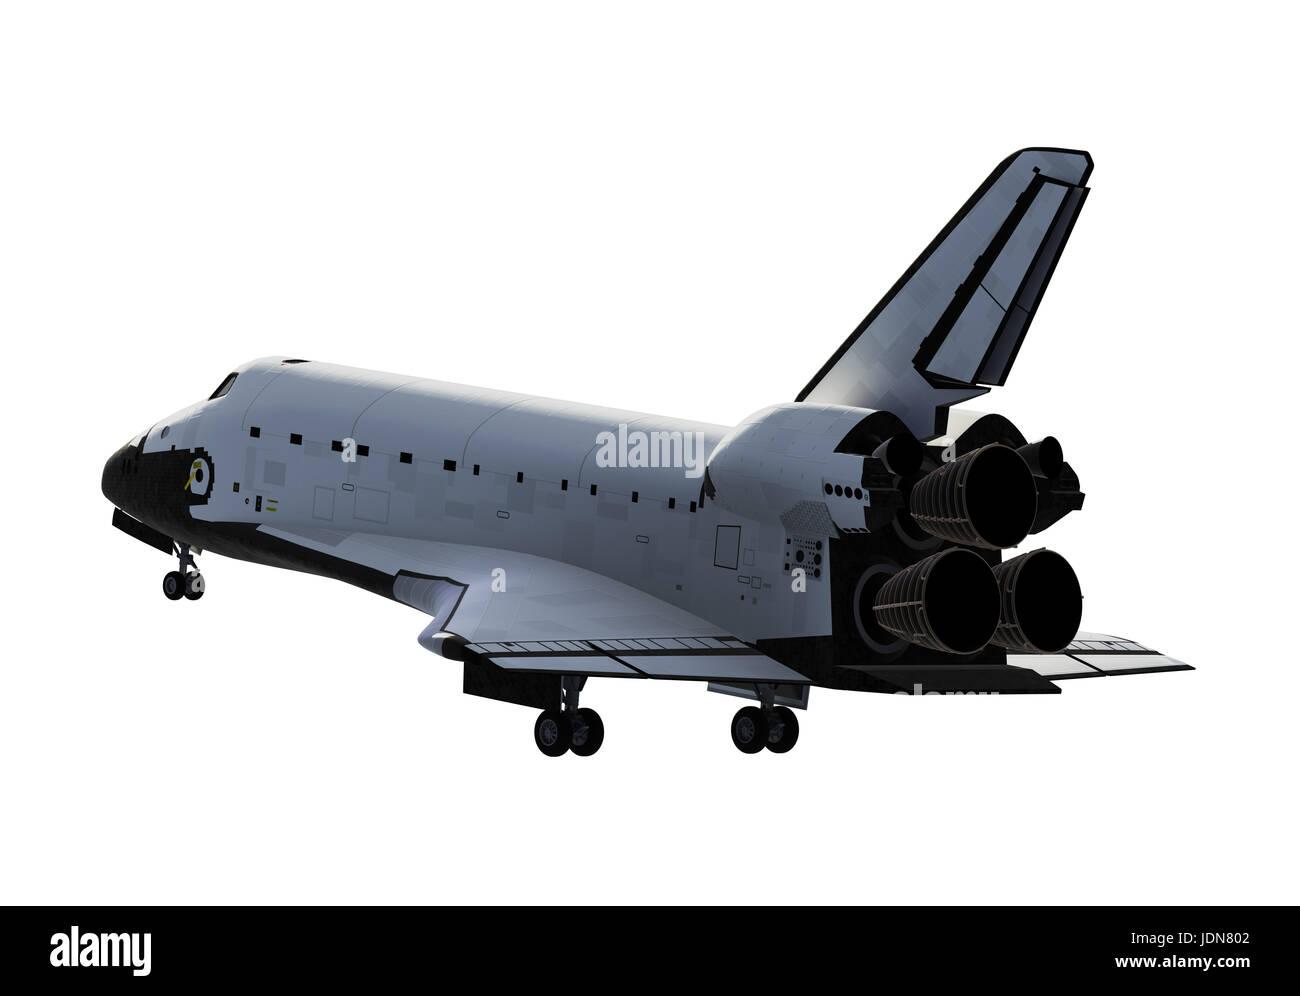 space shuttle enterprise landing - photo #37